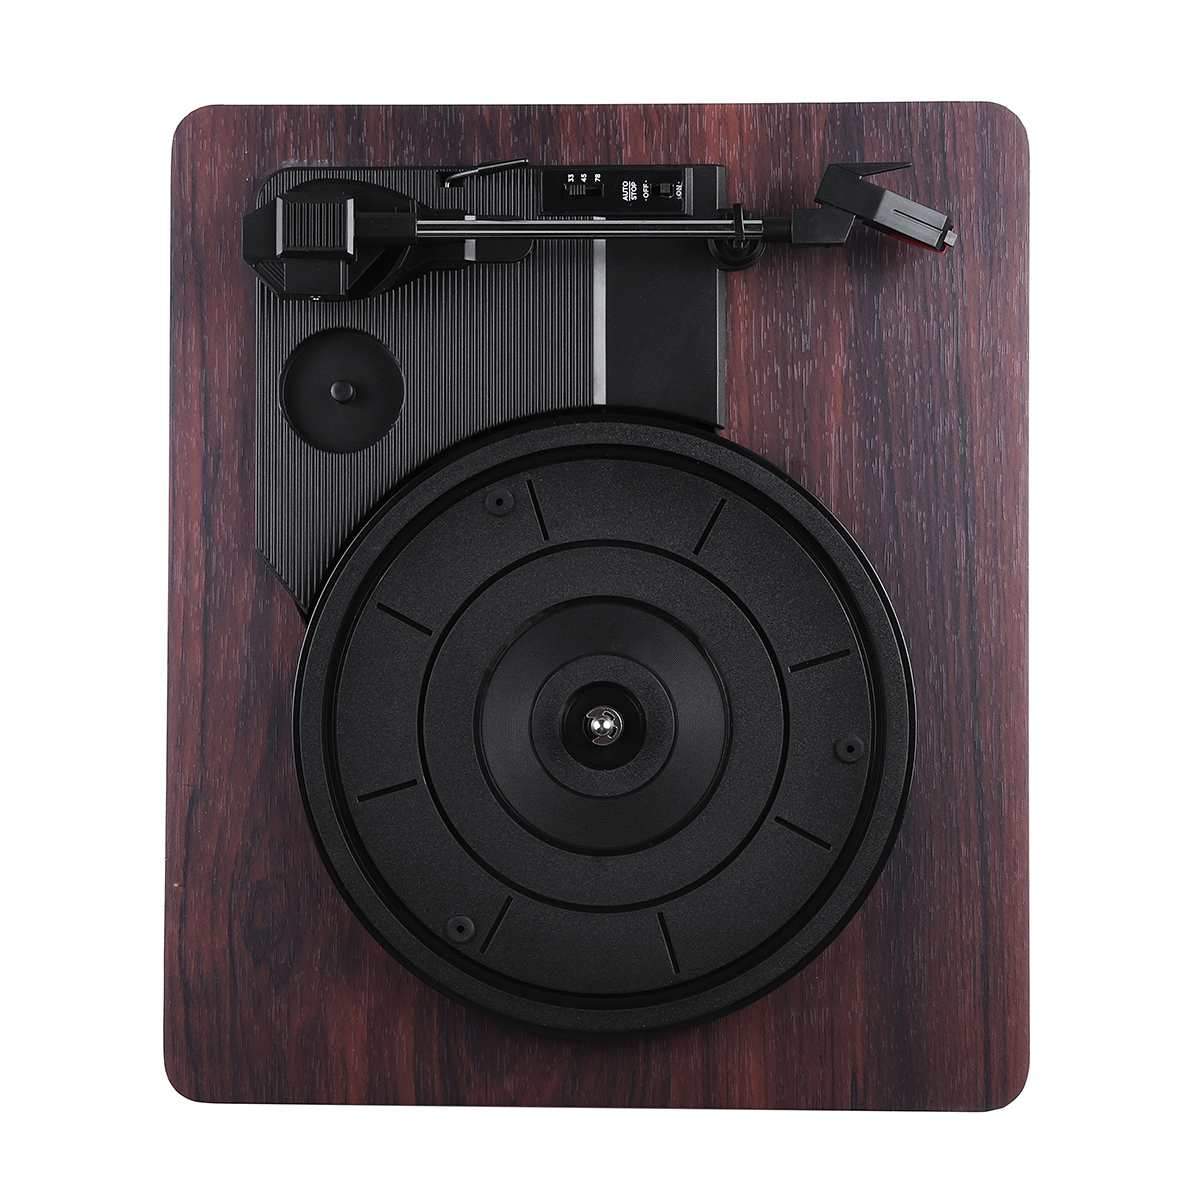 Analytisch 33 45 78 Rpm Record Player Antiken Grammophon Plattenspieler Disc Vinyl Audio Rca R/l 3,5mm Ausgang Out Usb Dc 5 V Holz Farbe Gesundheit Effektiv StäRken